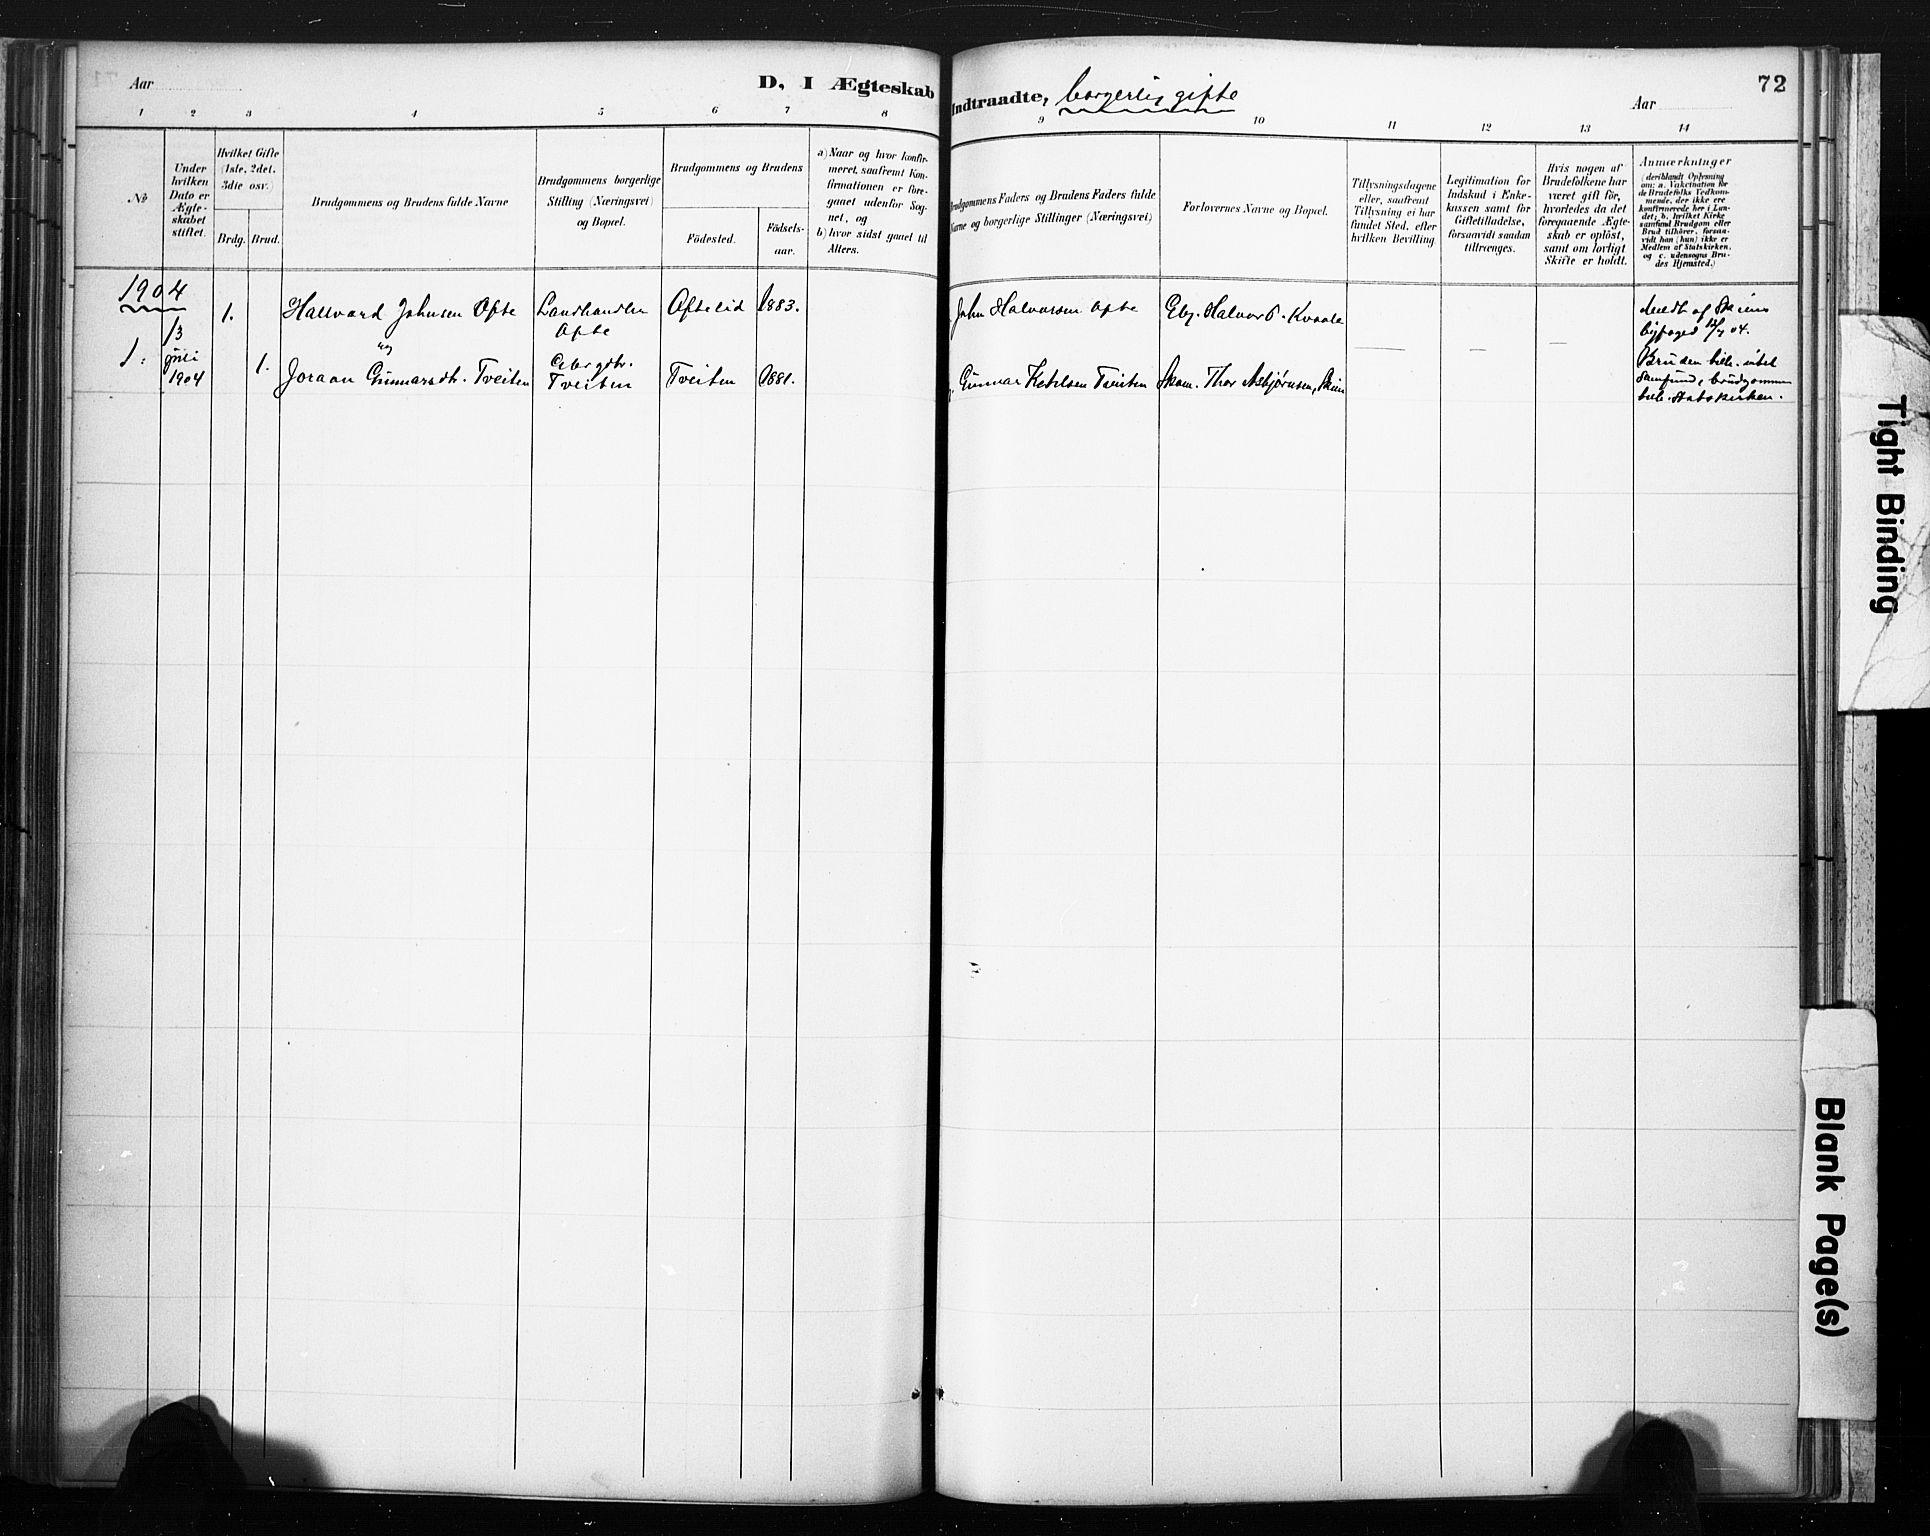 SAKO, Lårdal kirkebøker, F/Fc/L0002: Ministerialbok nr. III 2, 1887-1906, s. 72